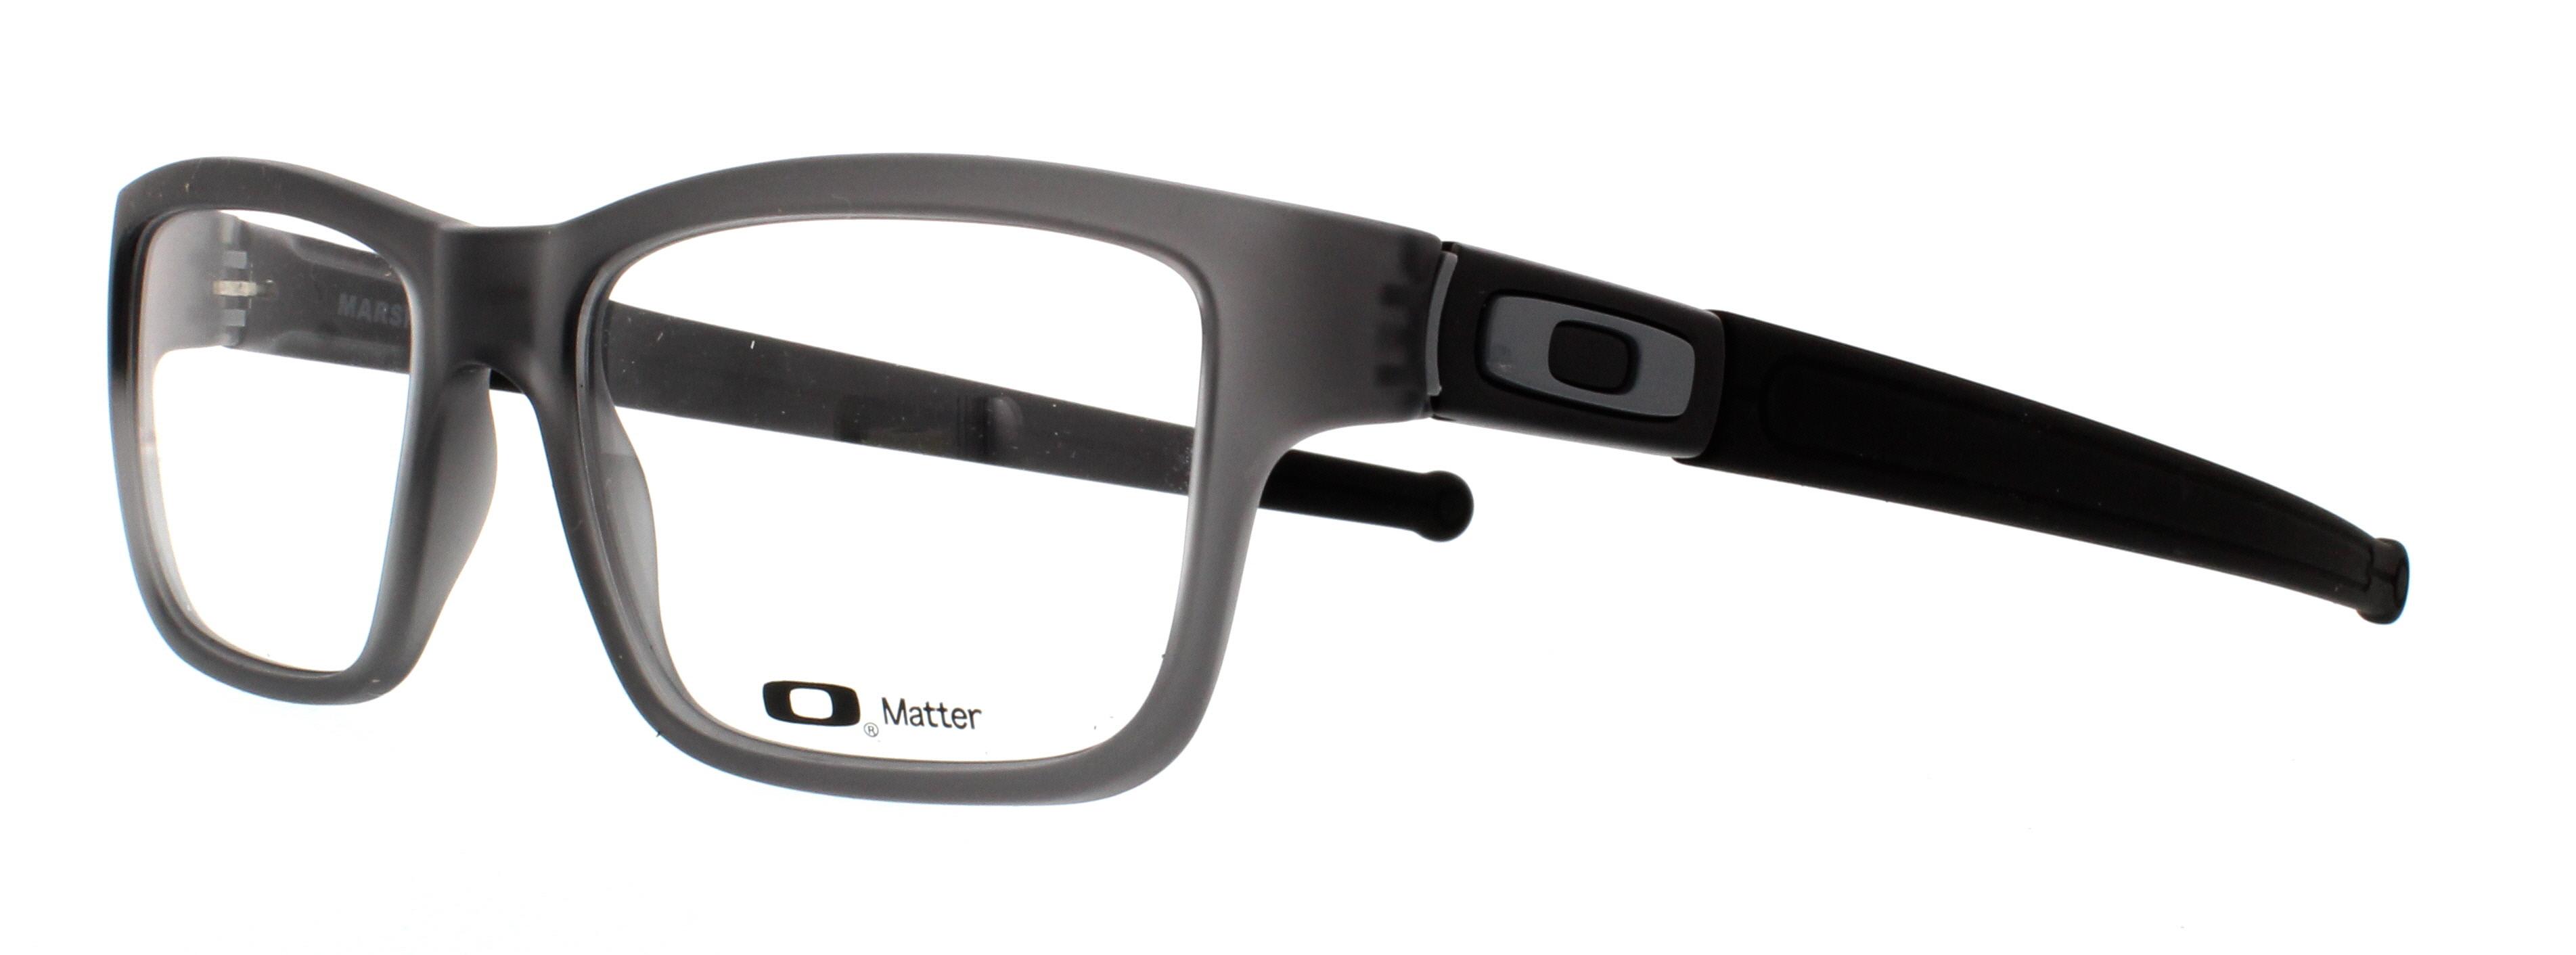 6dc0df7aff best oakley sunglasses marshal 53 mens satin black frame no b5a0f 547d9